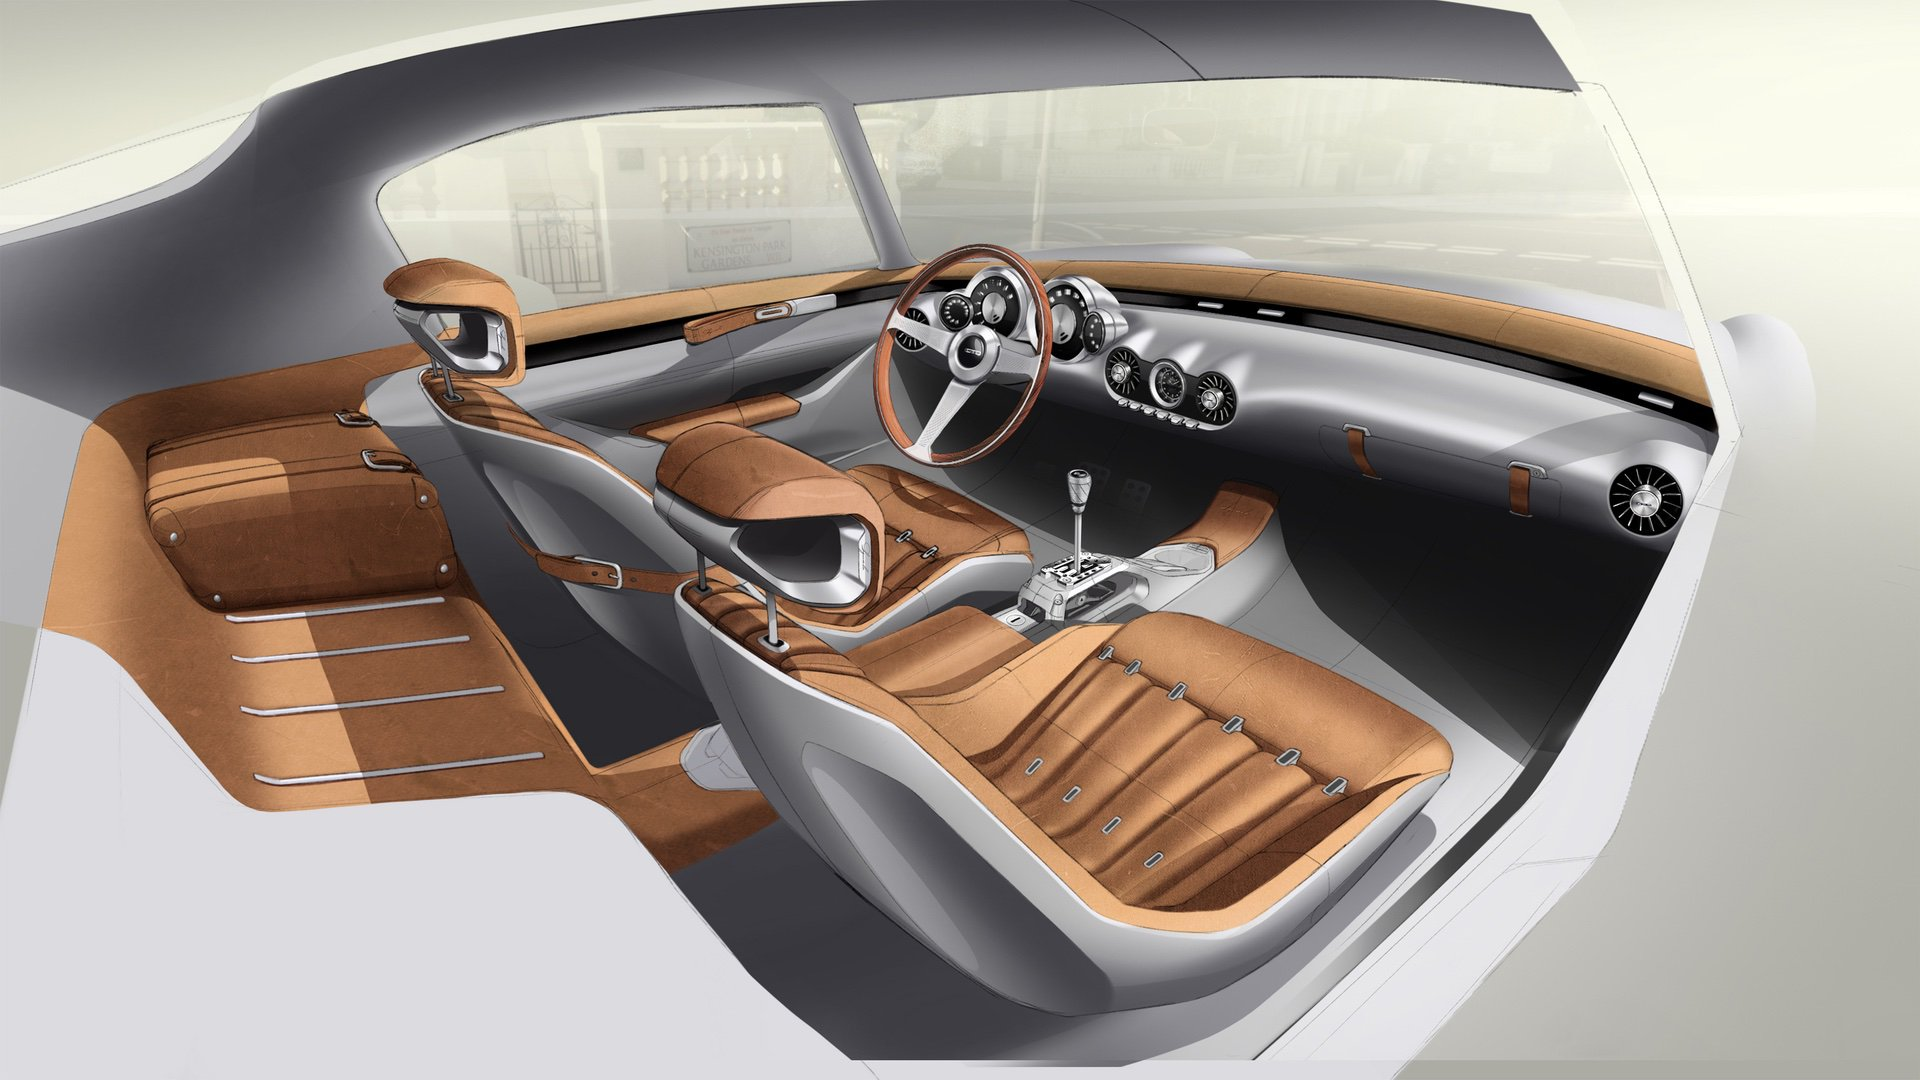 GTO_Engineering_Squalo_interior_design_drawings-0000